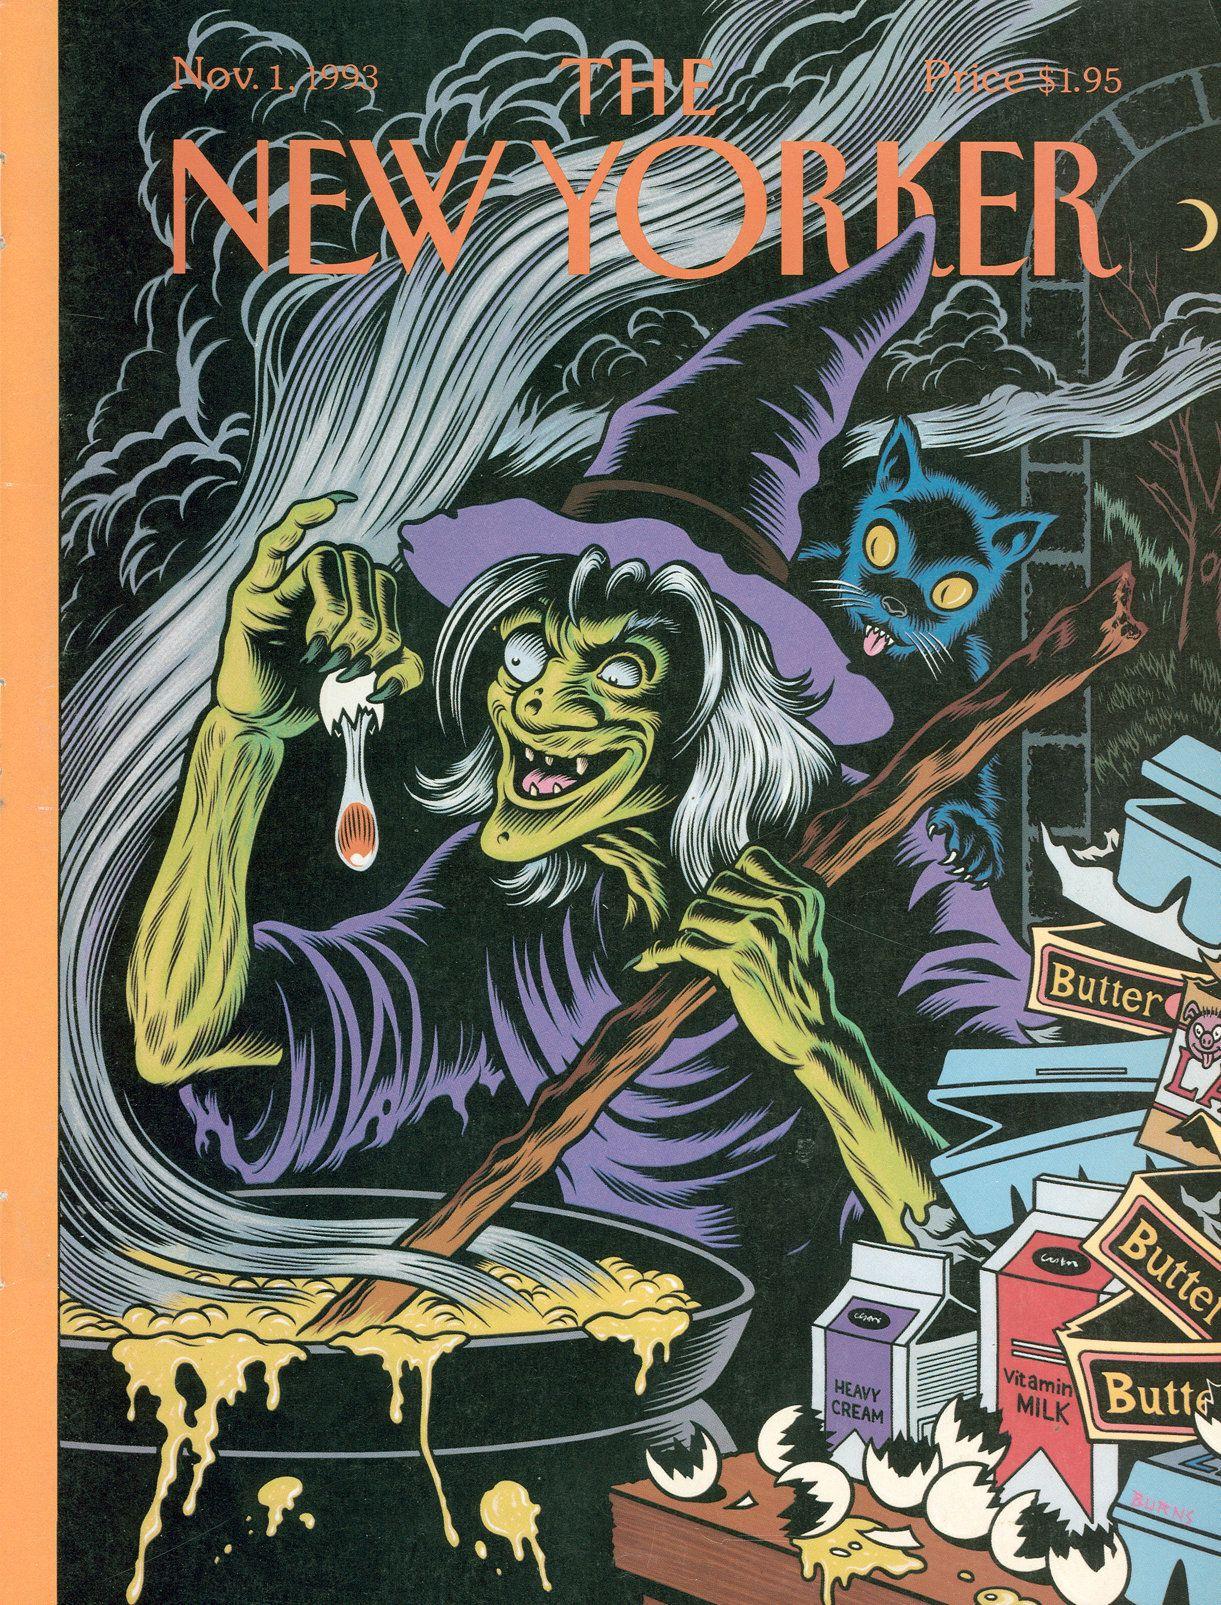 Halloween 1 November.The New Yorker Monday November 1 1993 Issue 3583